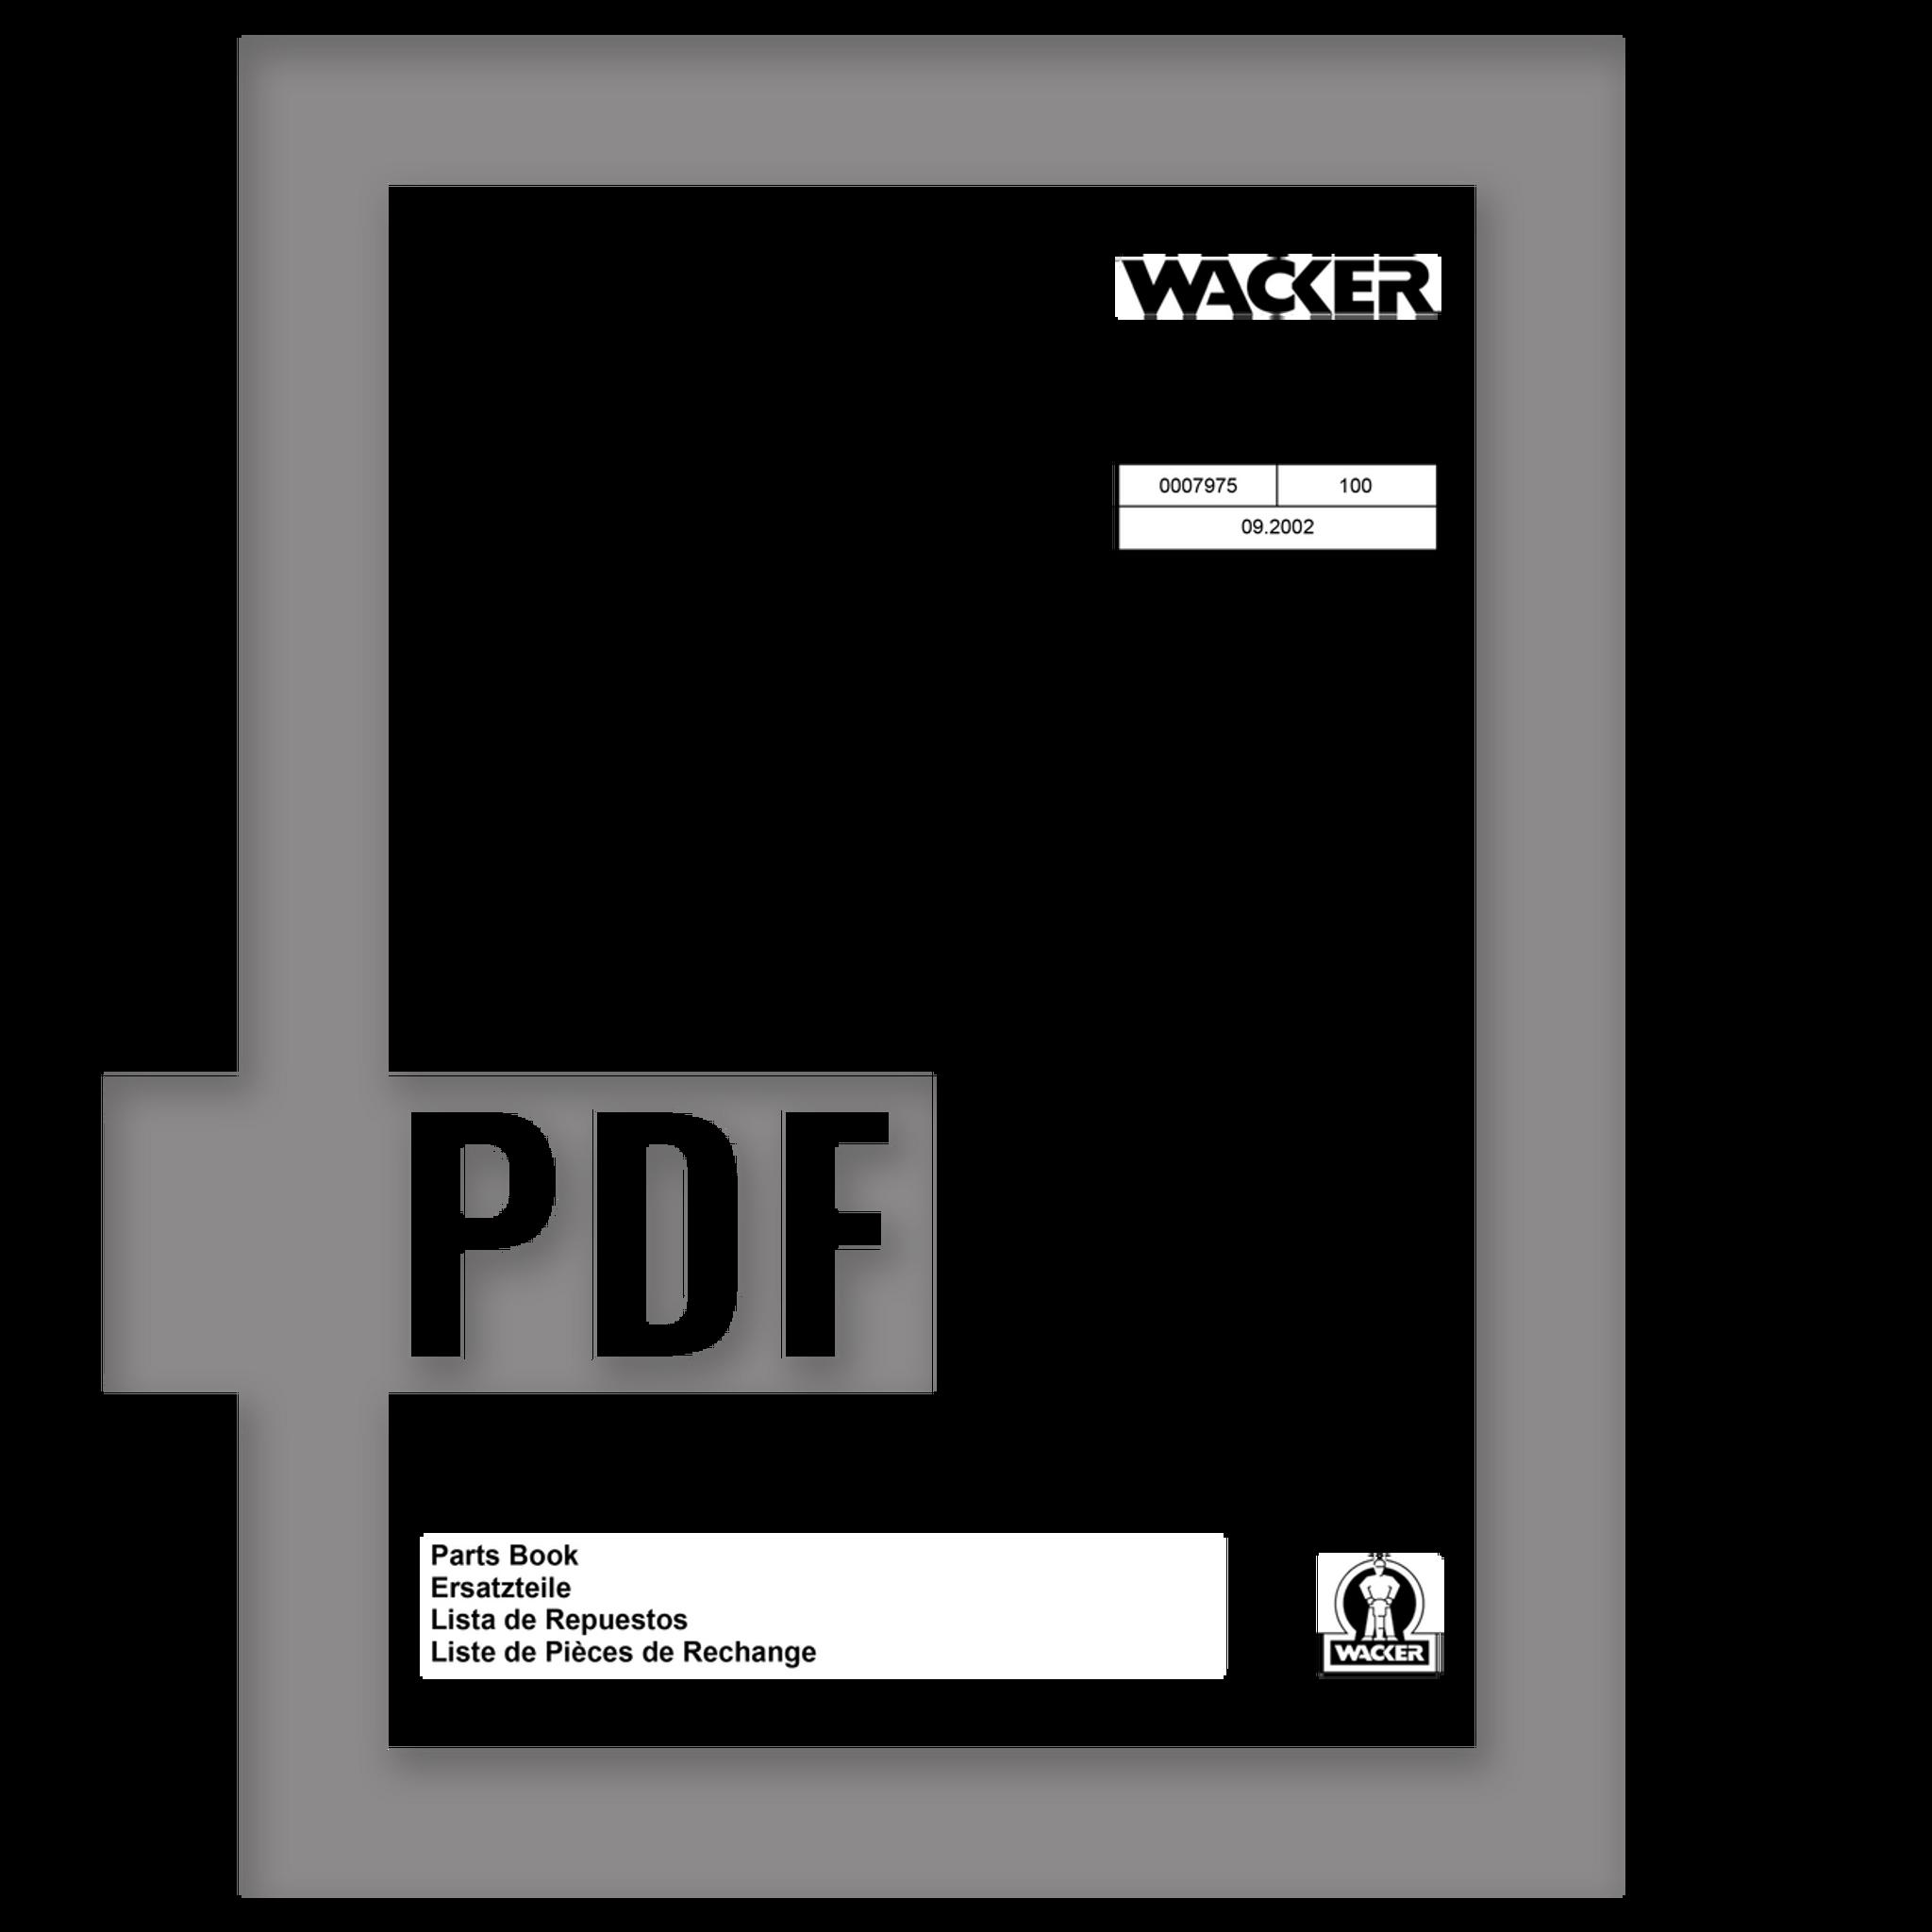 Parts Manual | BTS1035 - Item: 0007975, REV 100 | Free Download